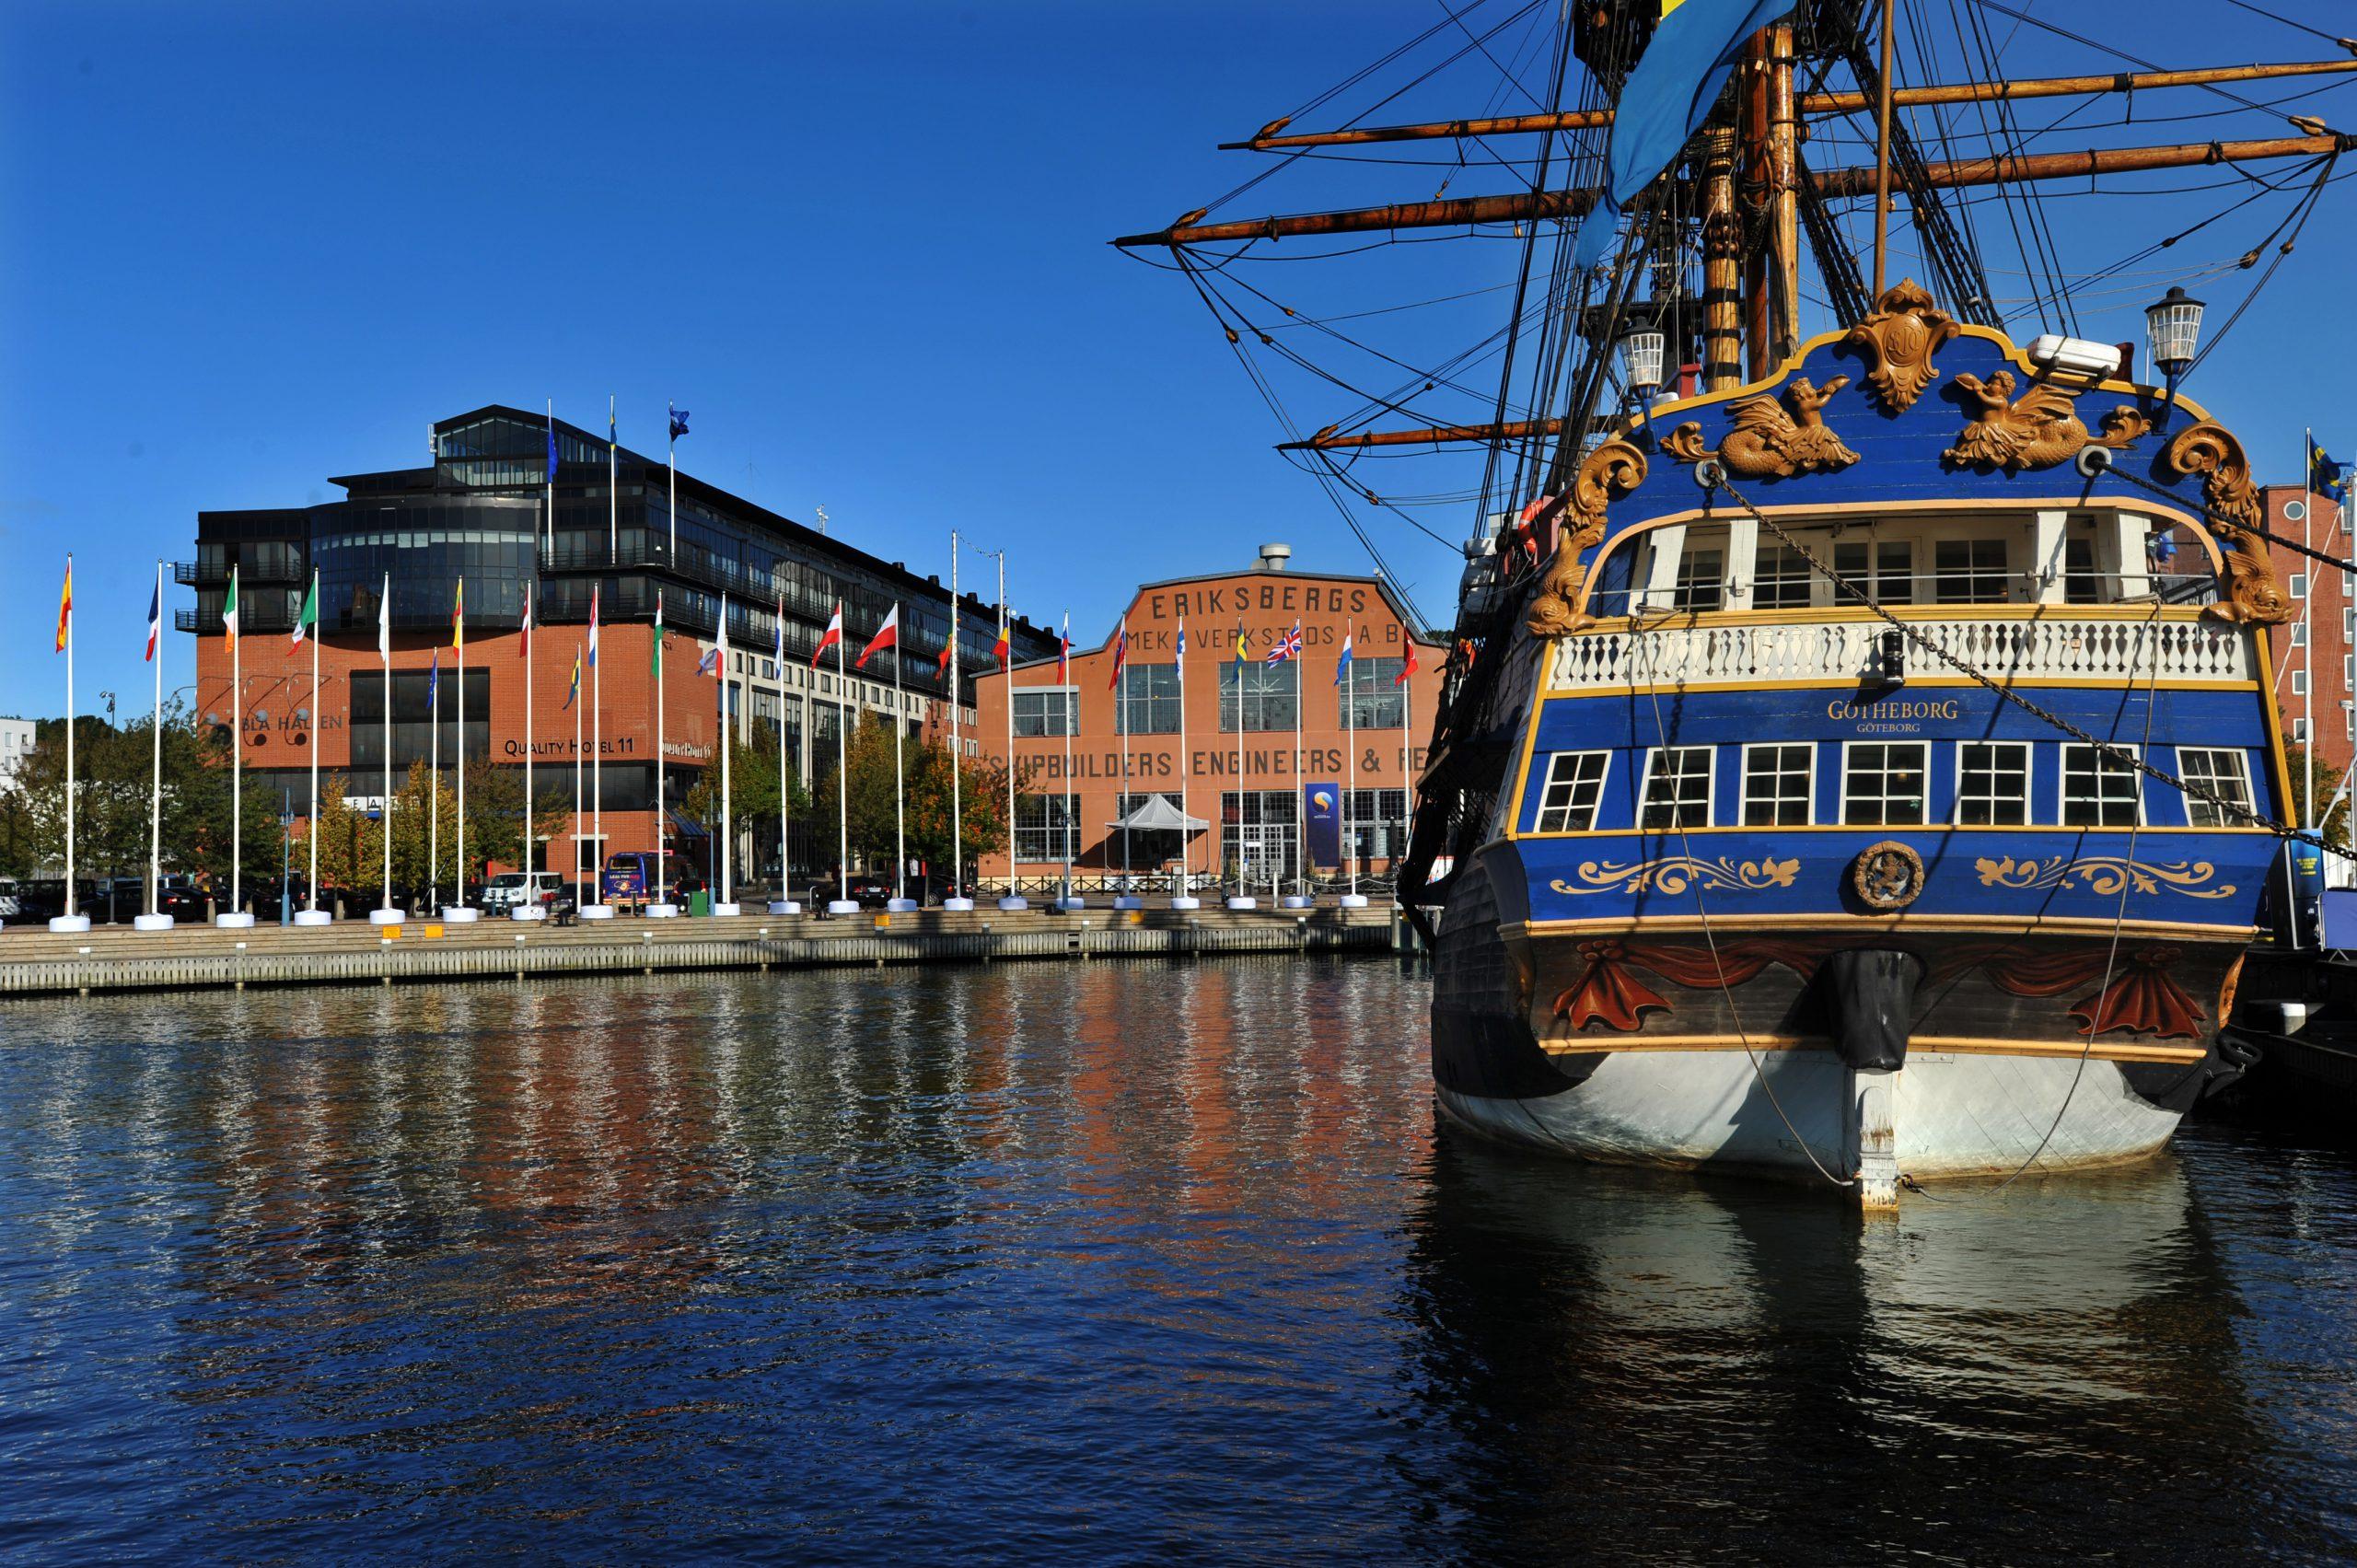 ett äldre segelfartyg ligger i hamnen framför eriksbergshallen som syns i bakgrunden